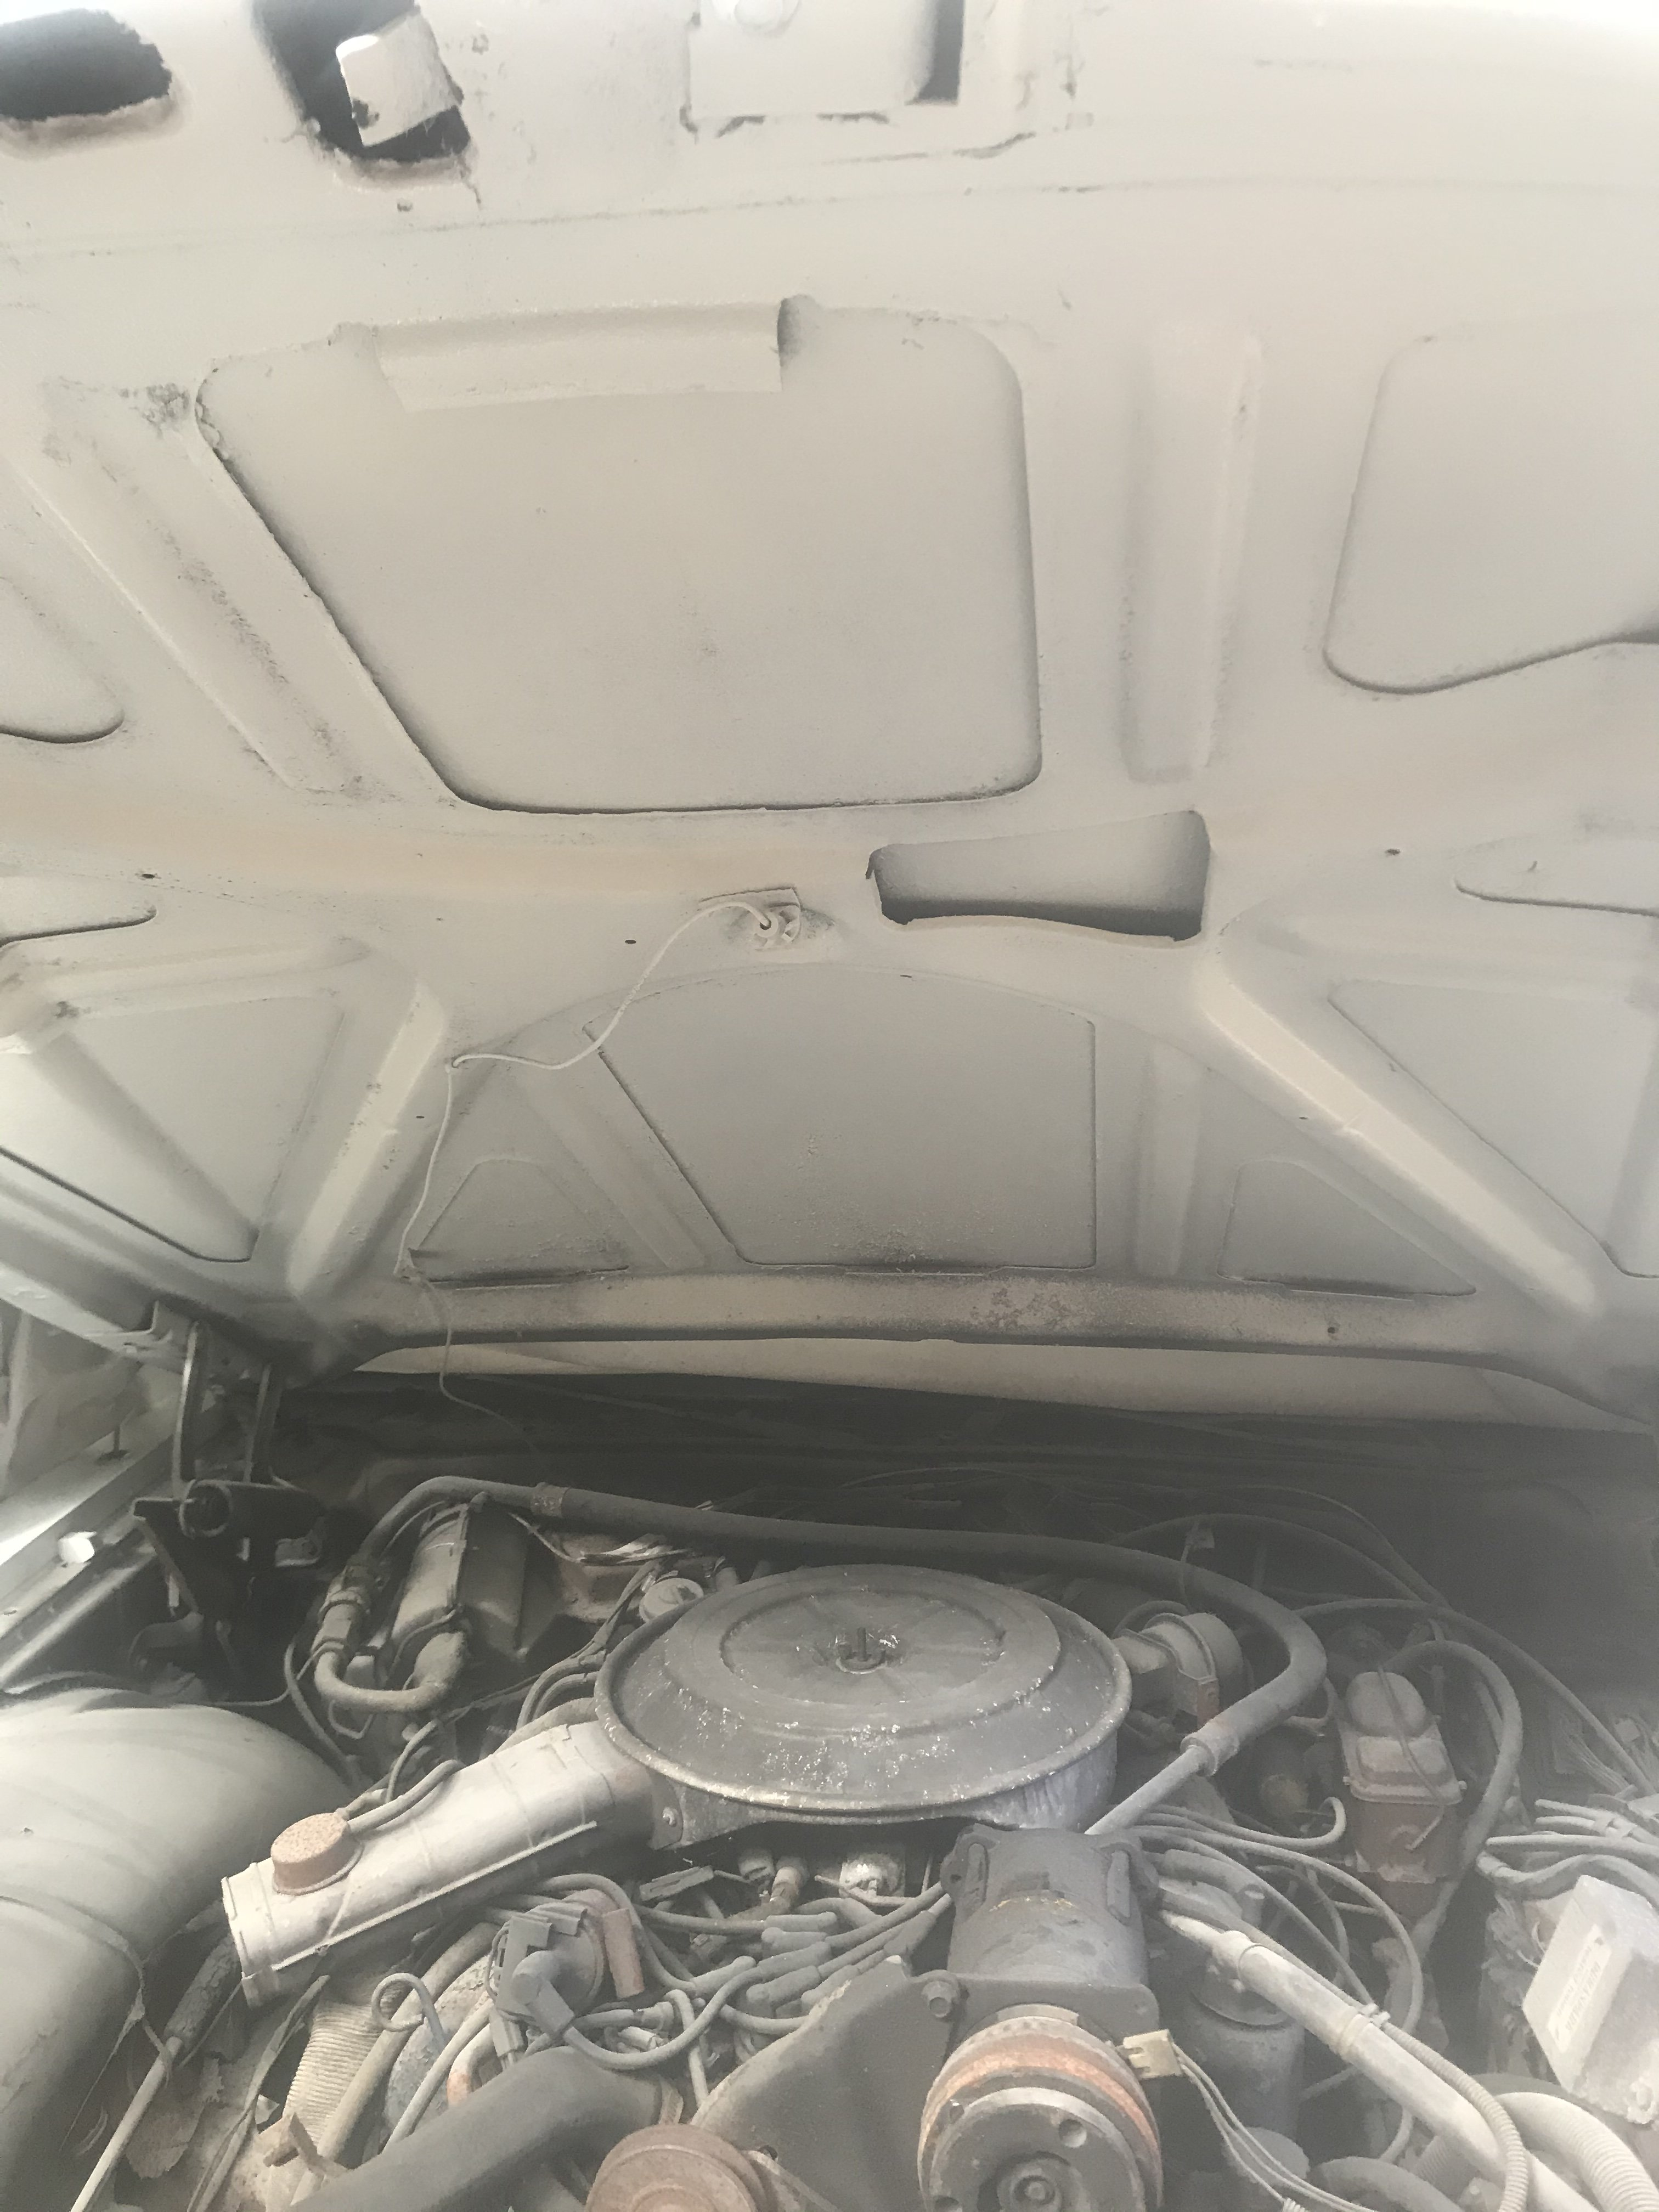 1978 rare lincoln convertable For Sale (picture 11 of 12)